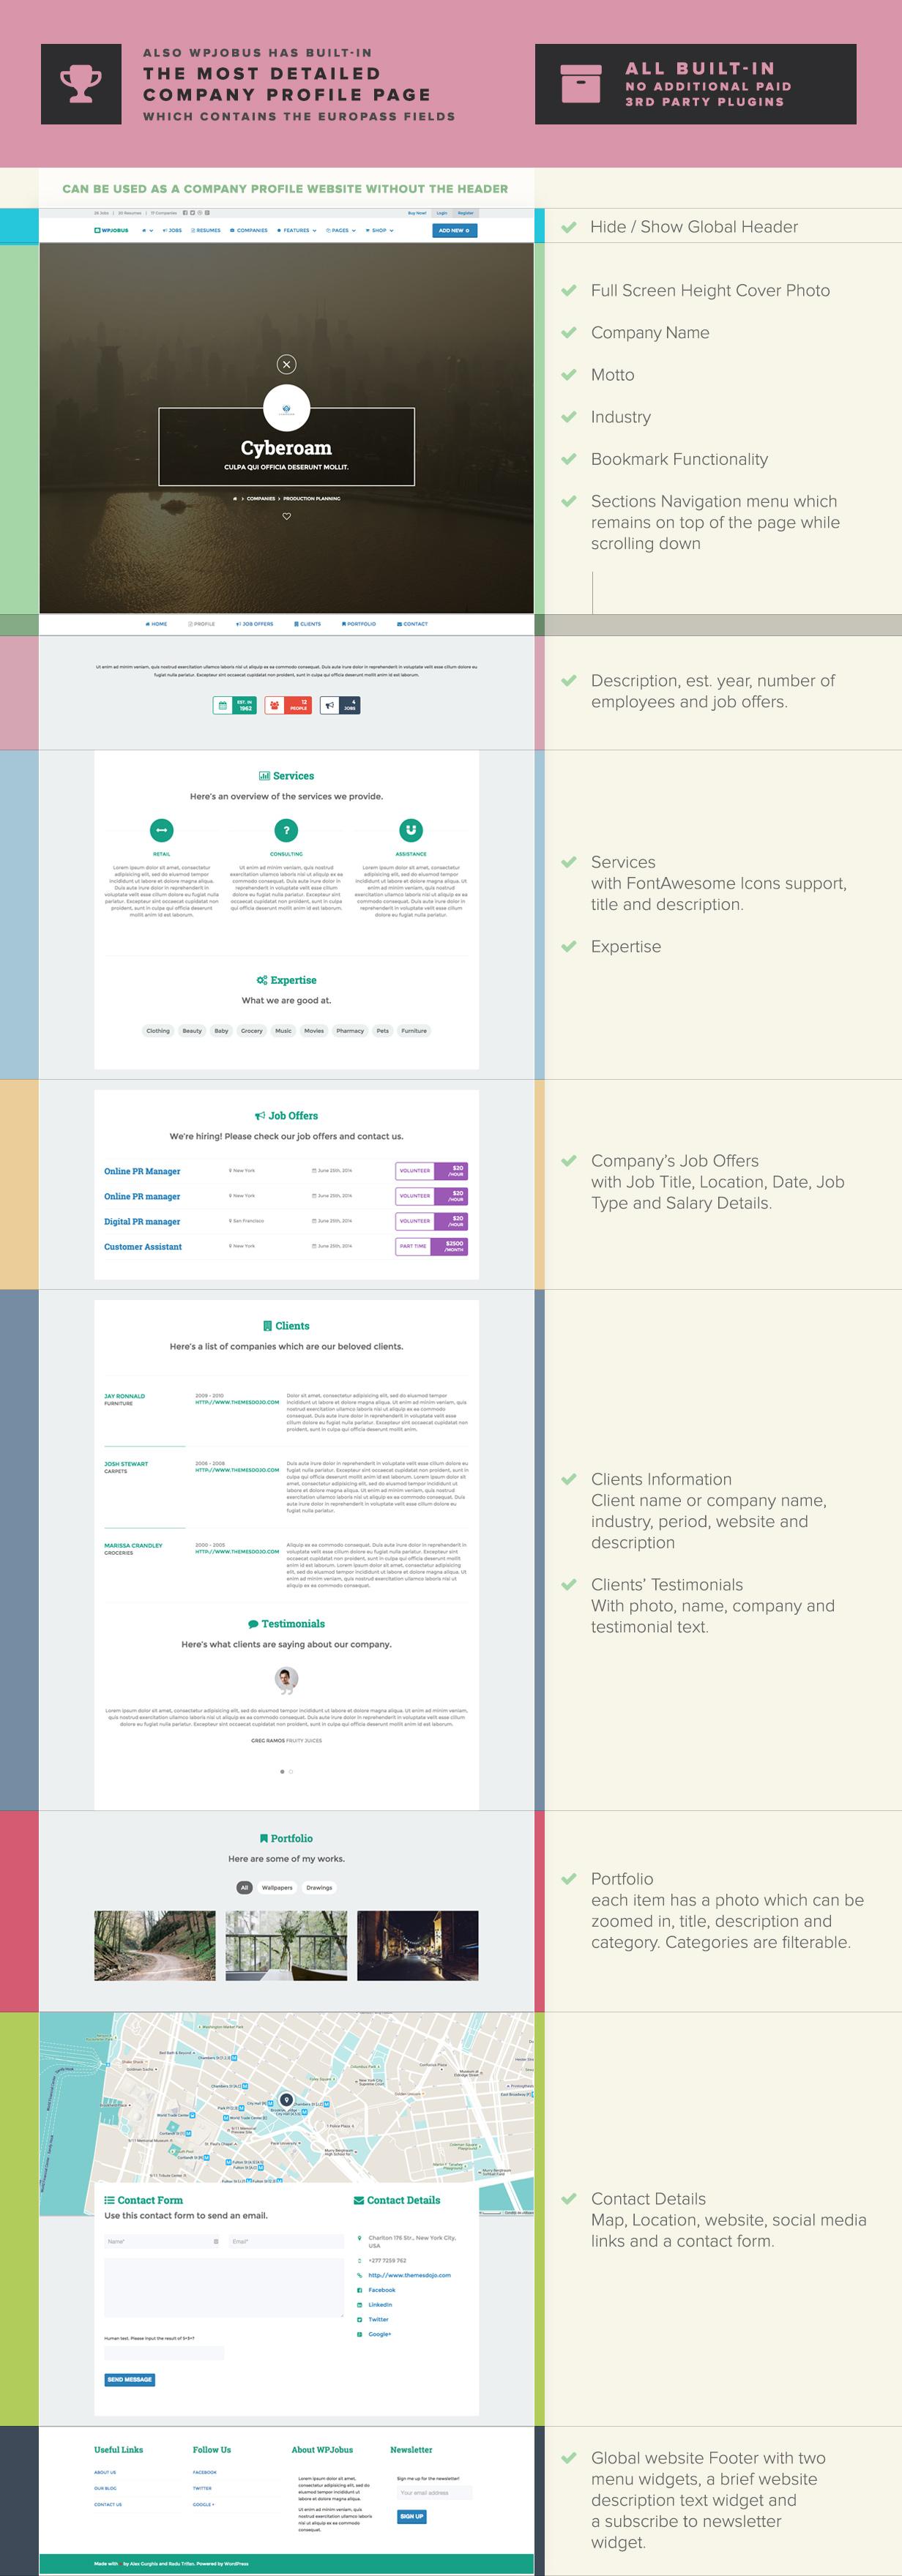 WPJobus - لوحة الوظائف والسير الذاتية لموضوع WordPress - 10